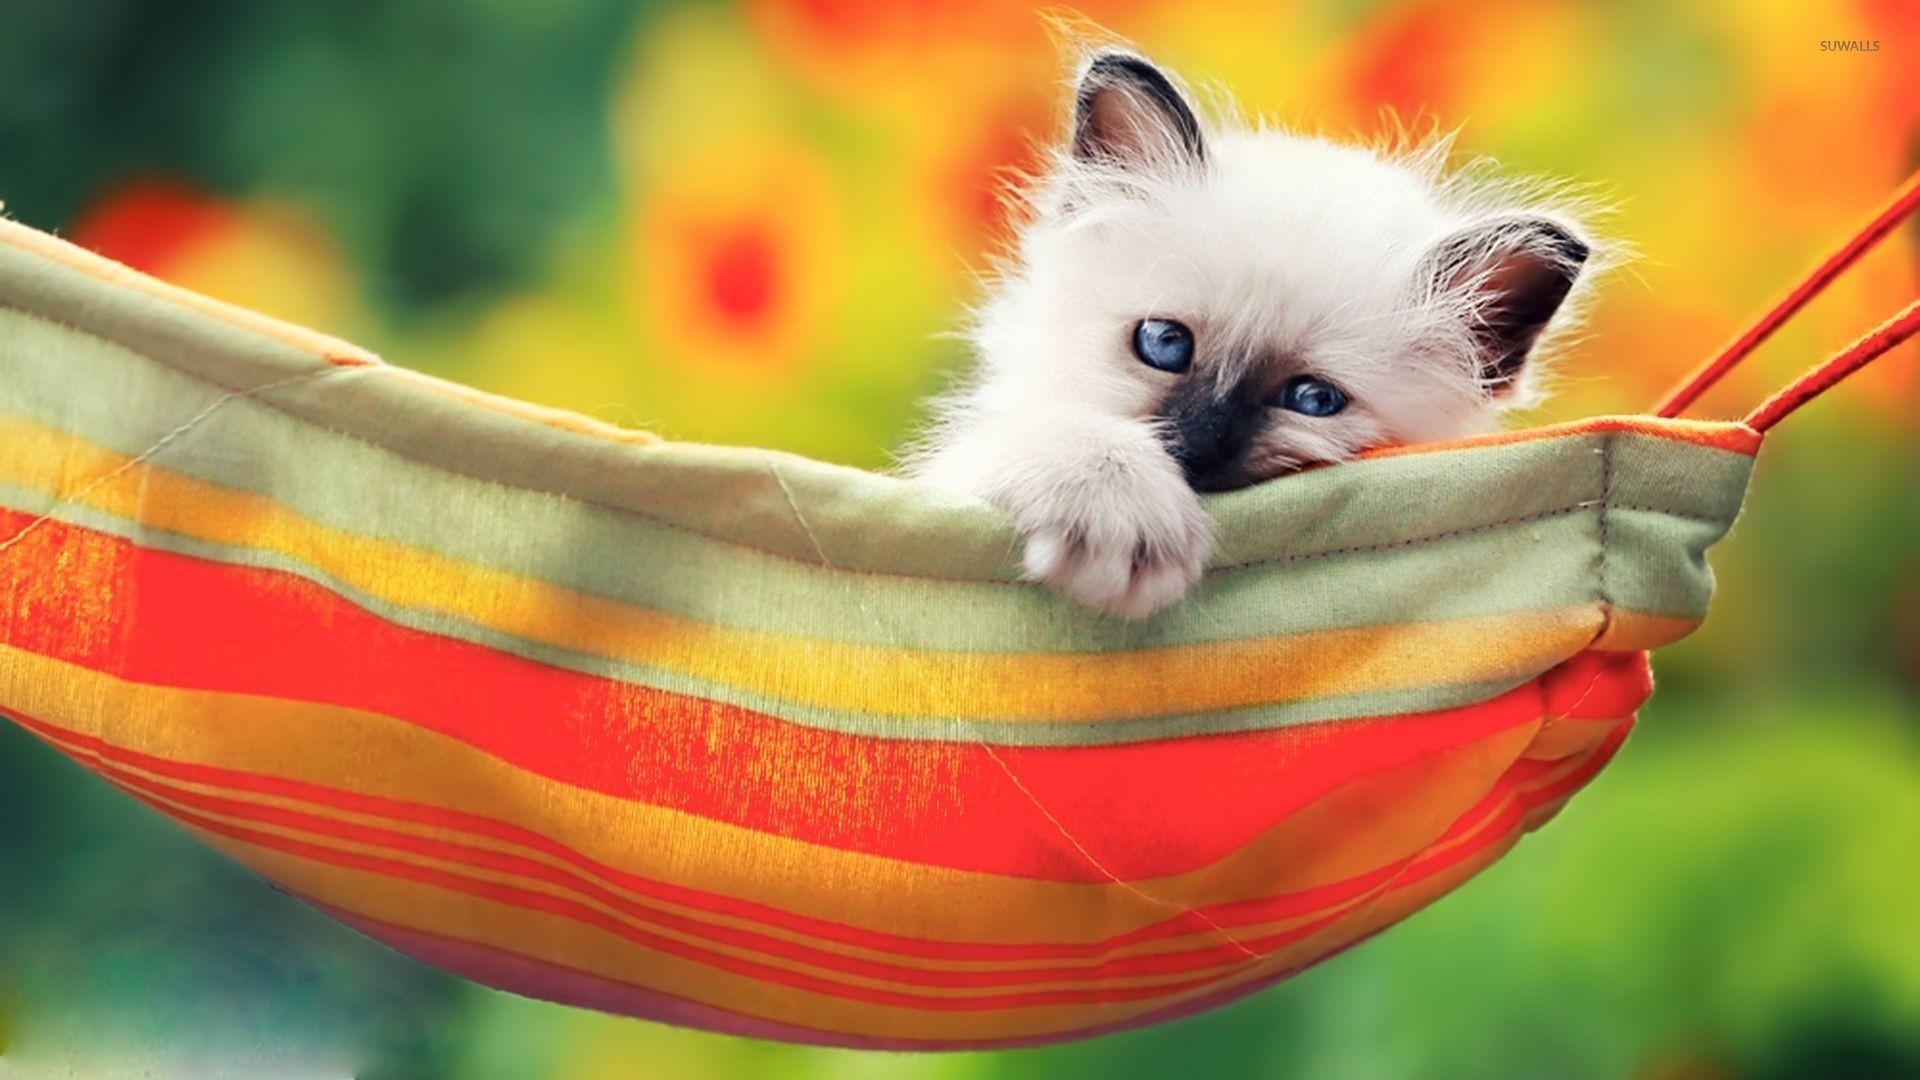 … kitten in the hammock wallpaper animal wallpapers 53082 …